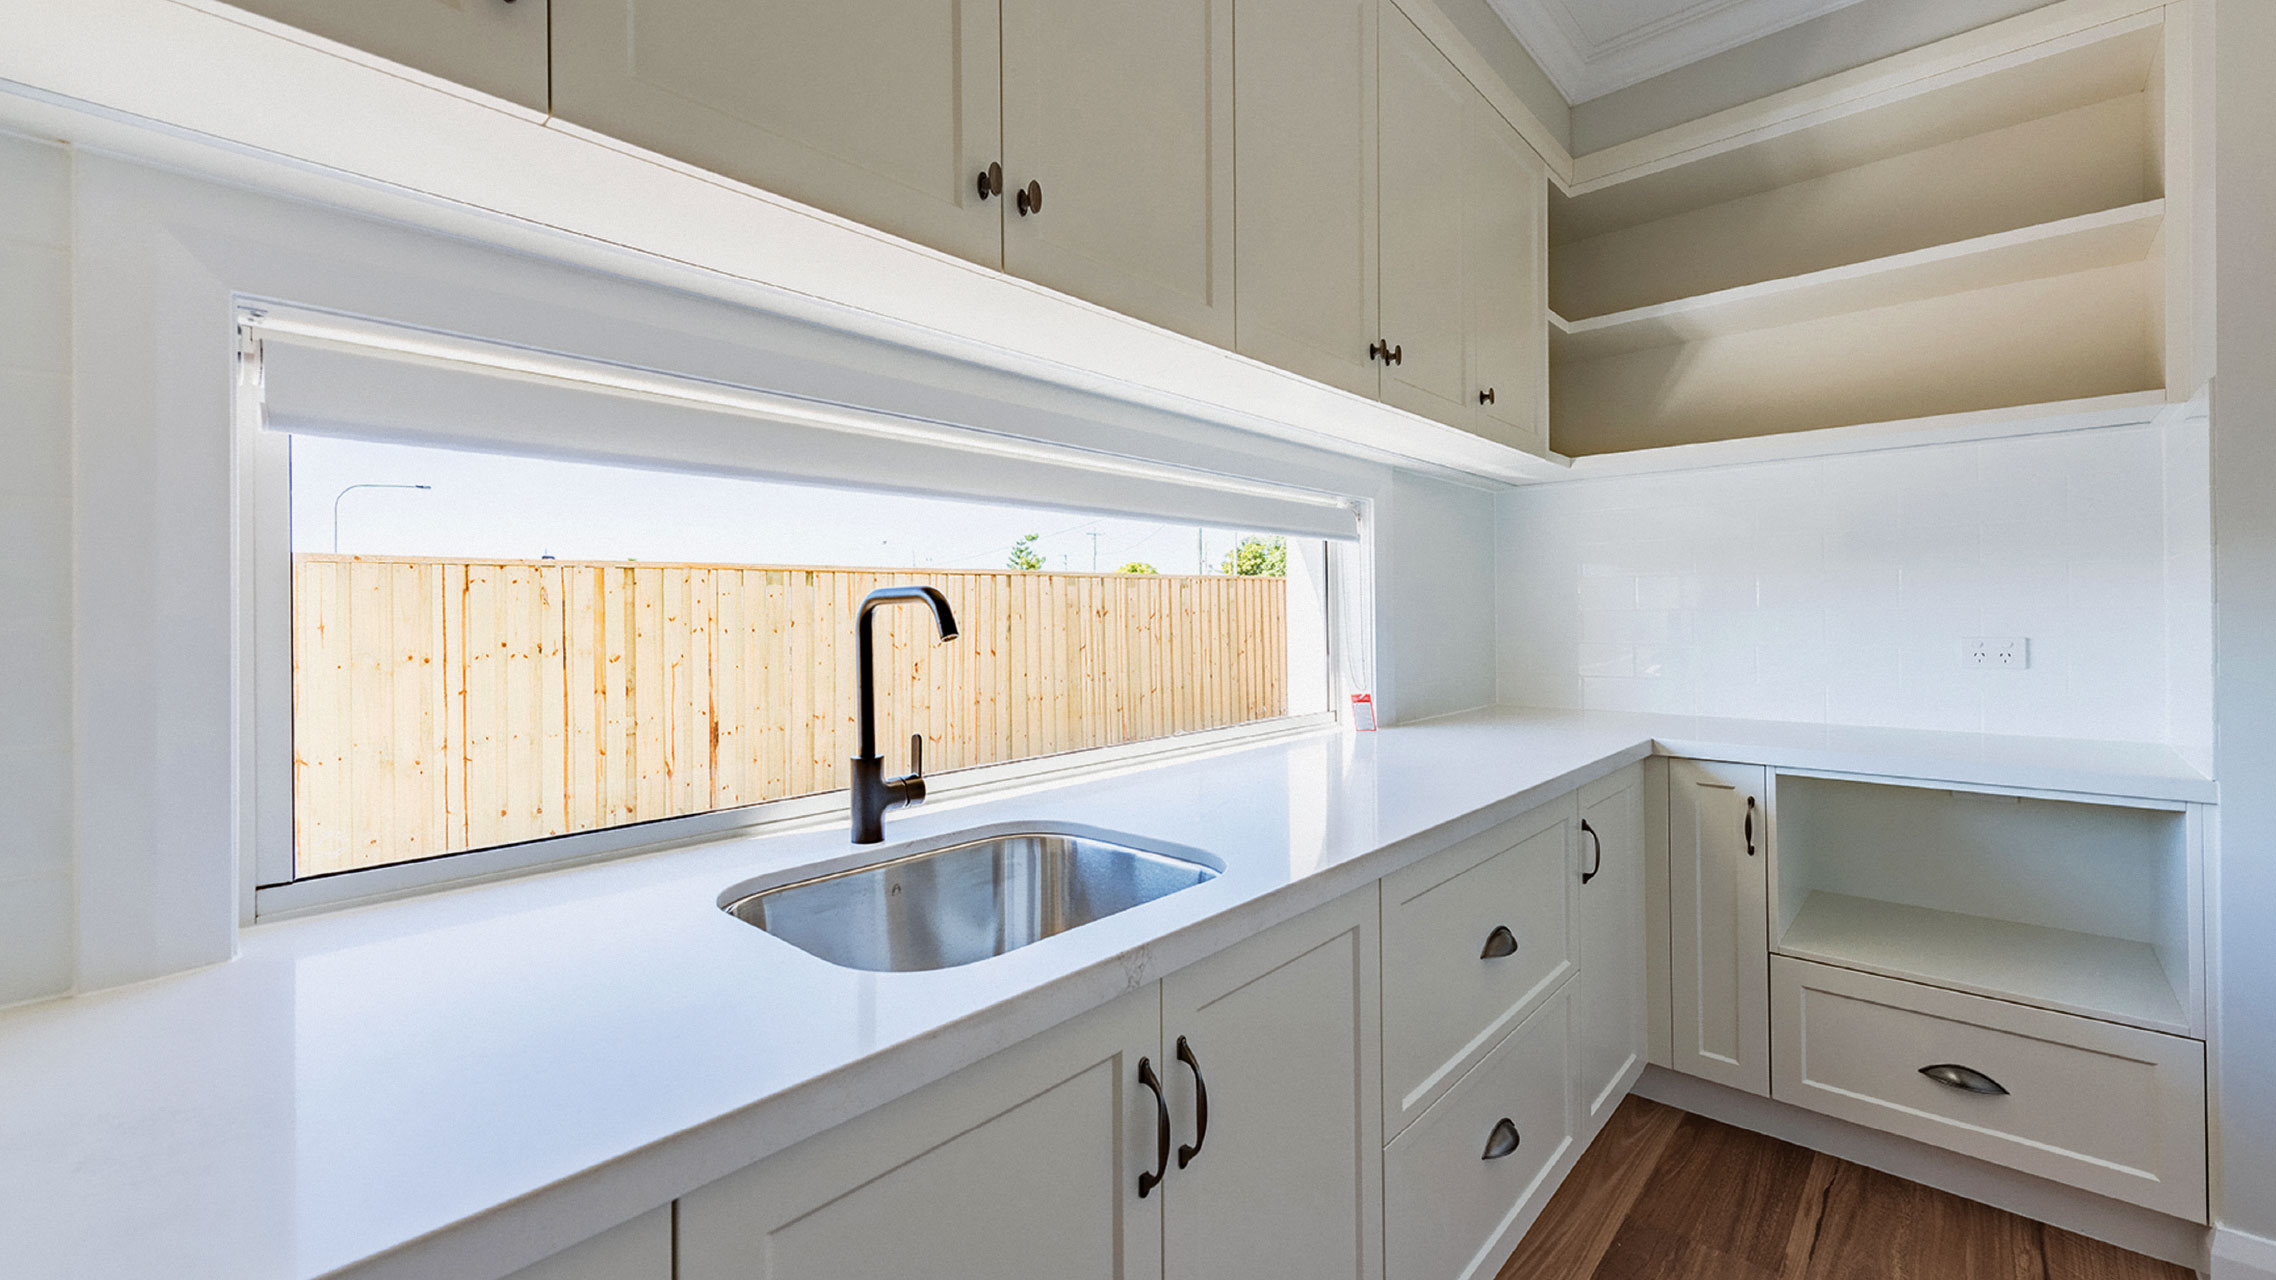 Aluminium Fixed Window above kitchen bench